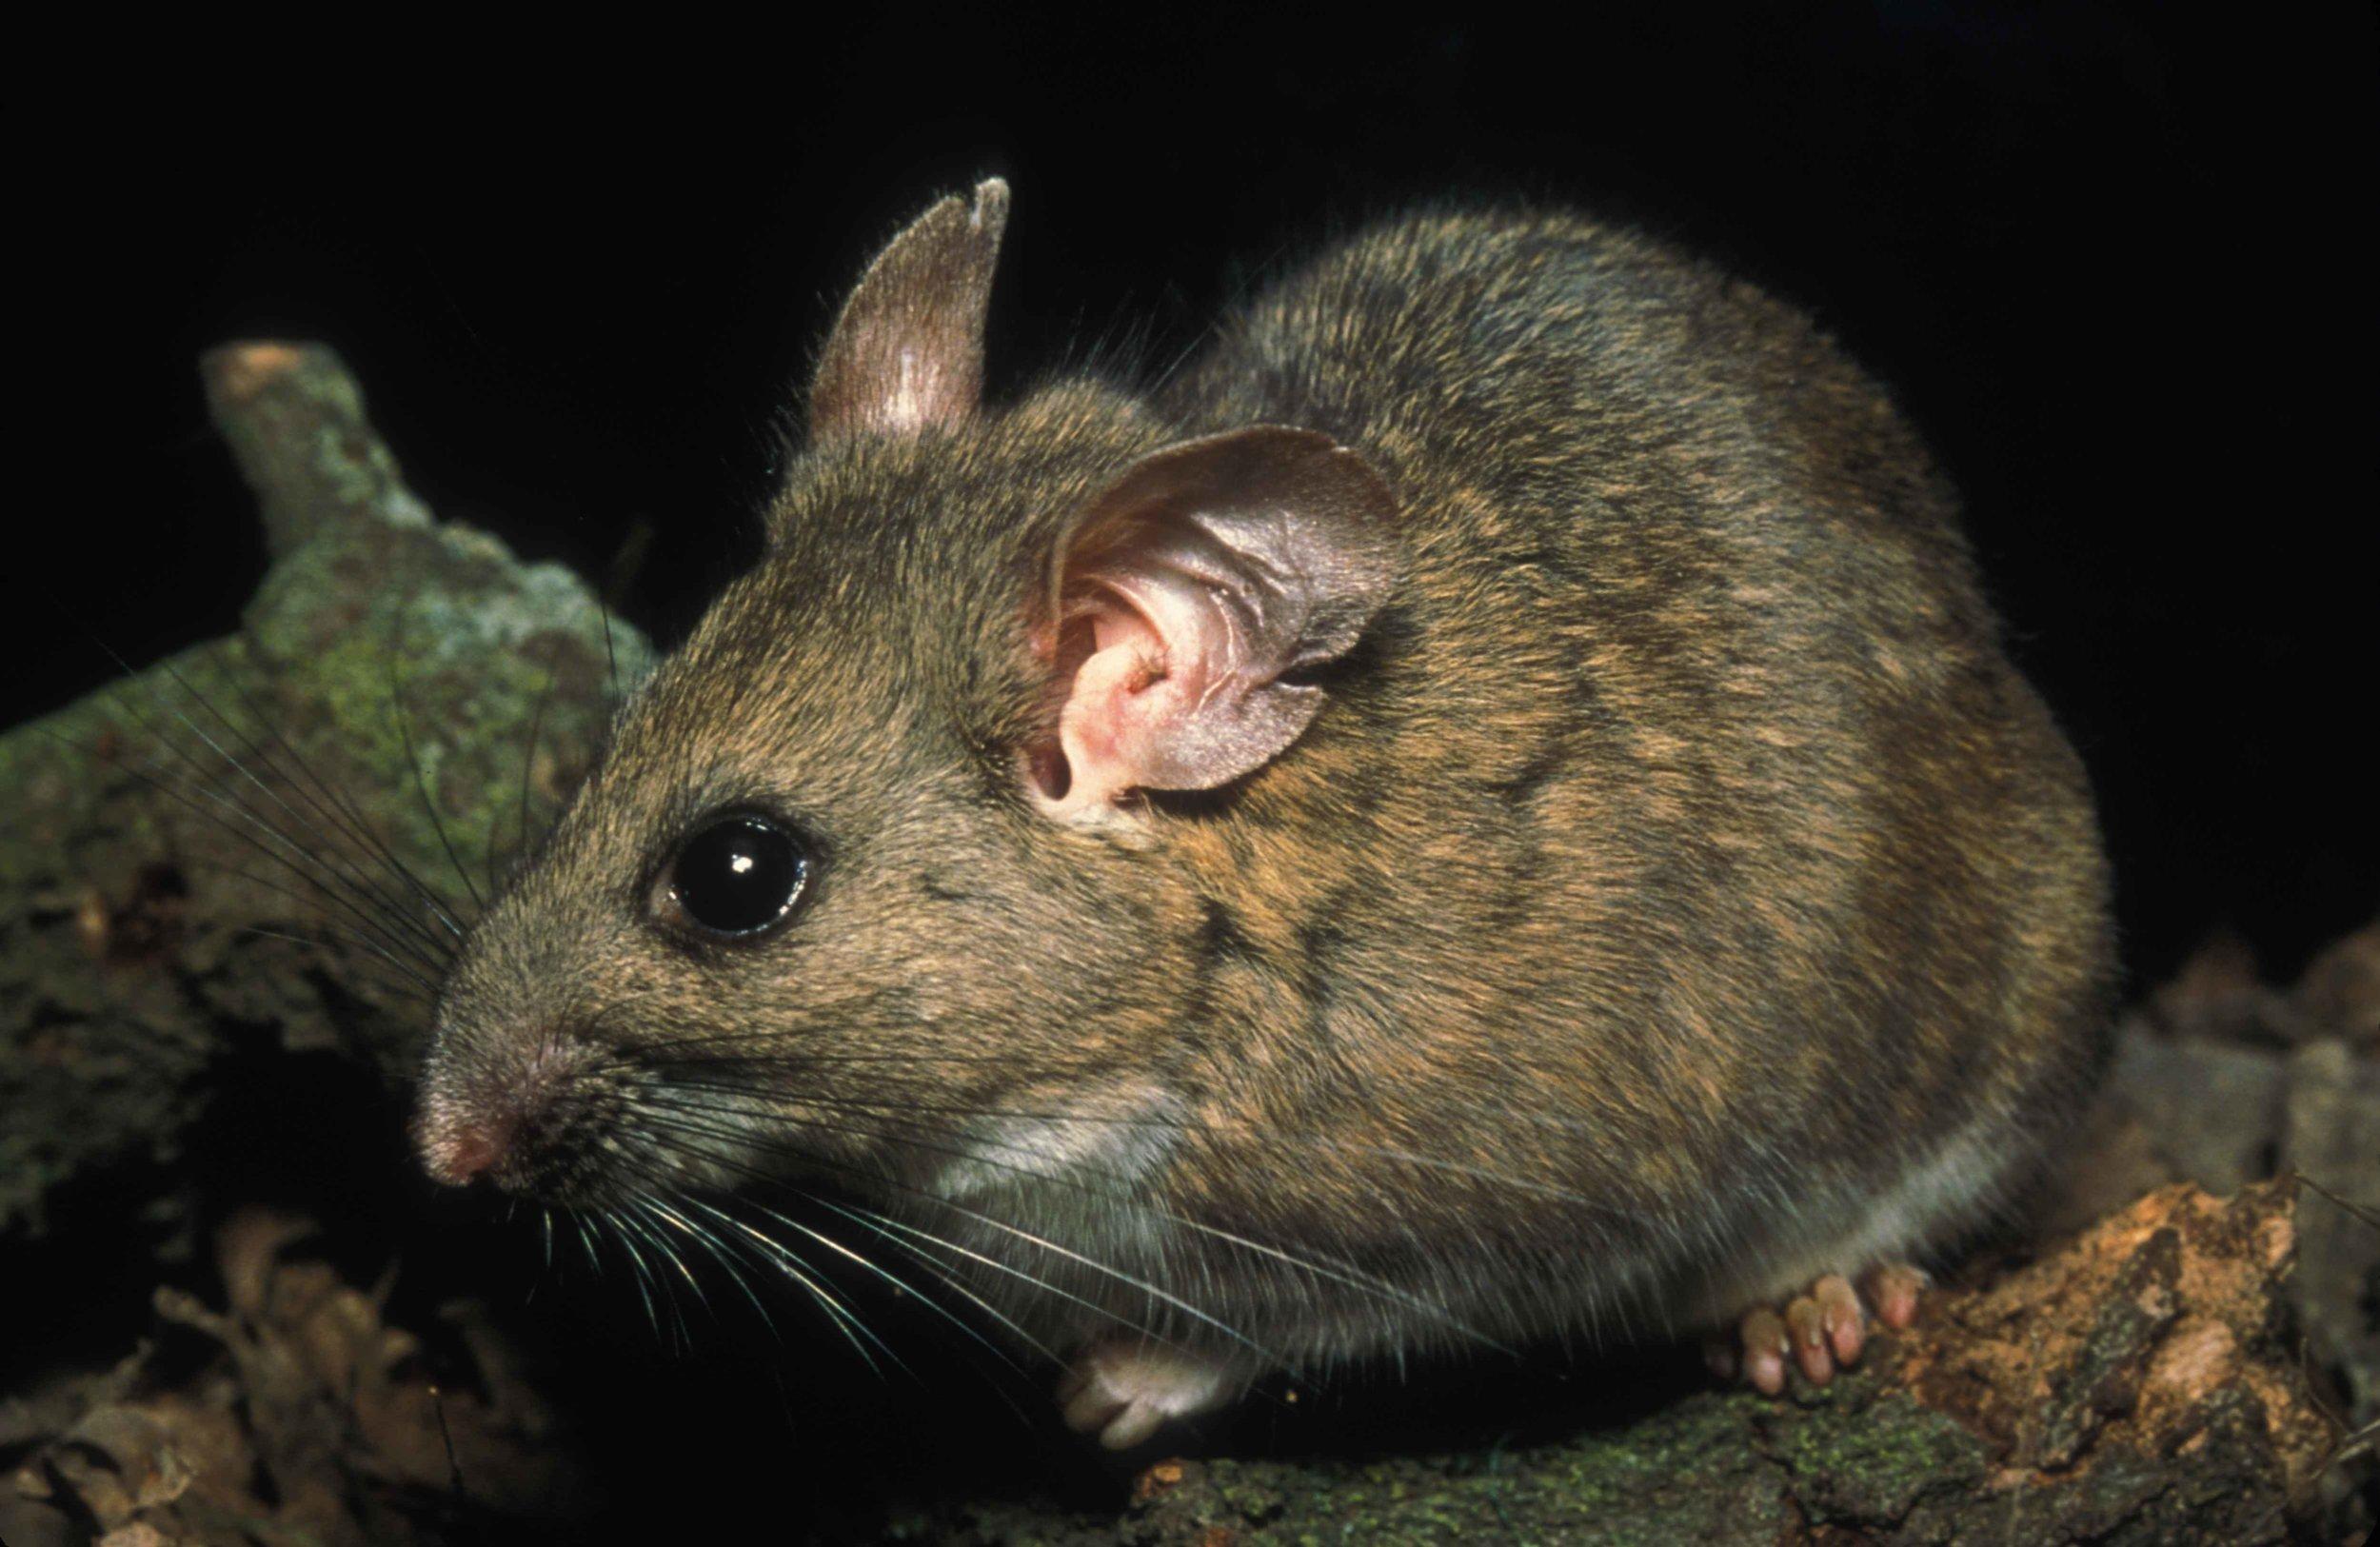 Riparian_woodrat_neotoma_fuscipes_riparia_endangered_mammal_species.jpg